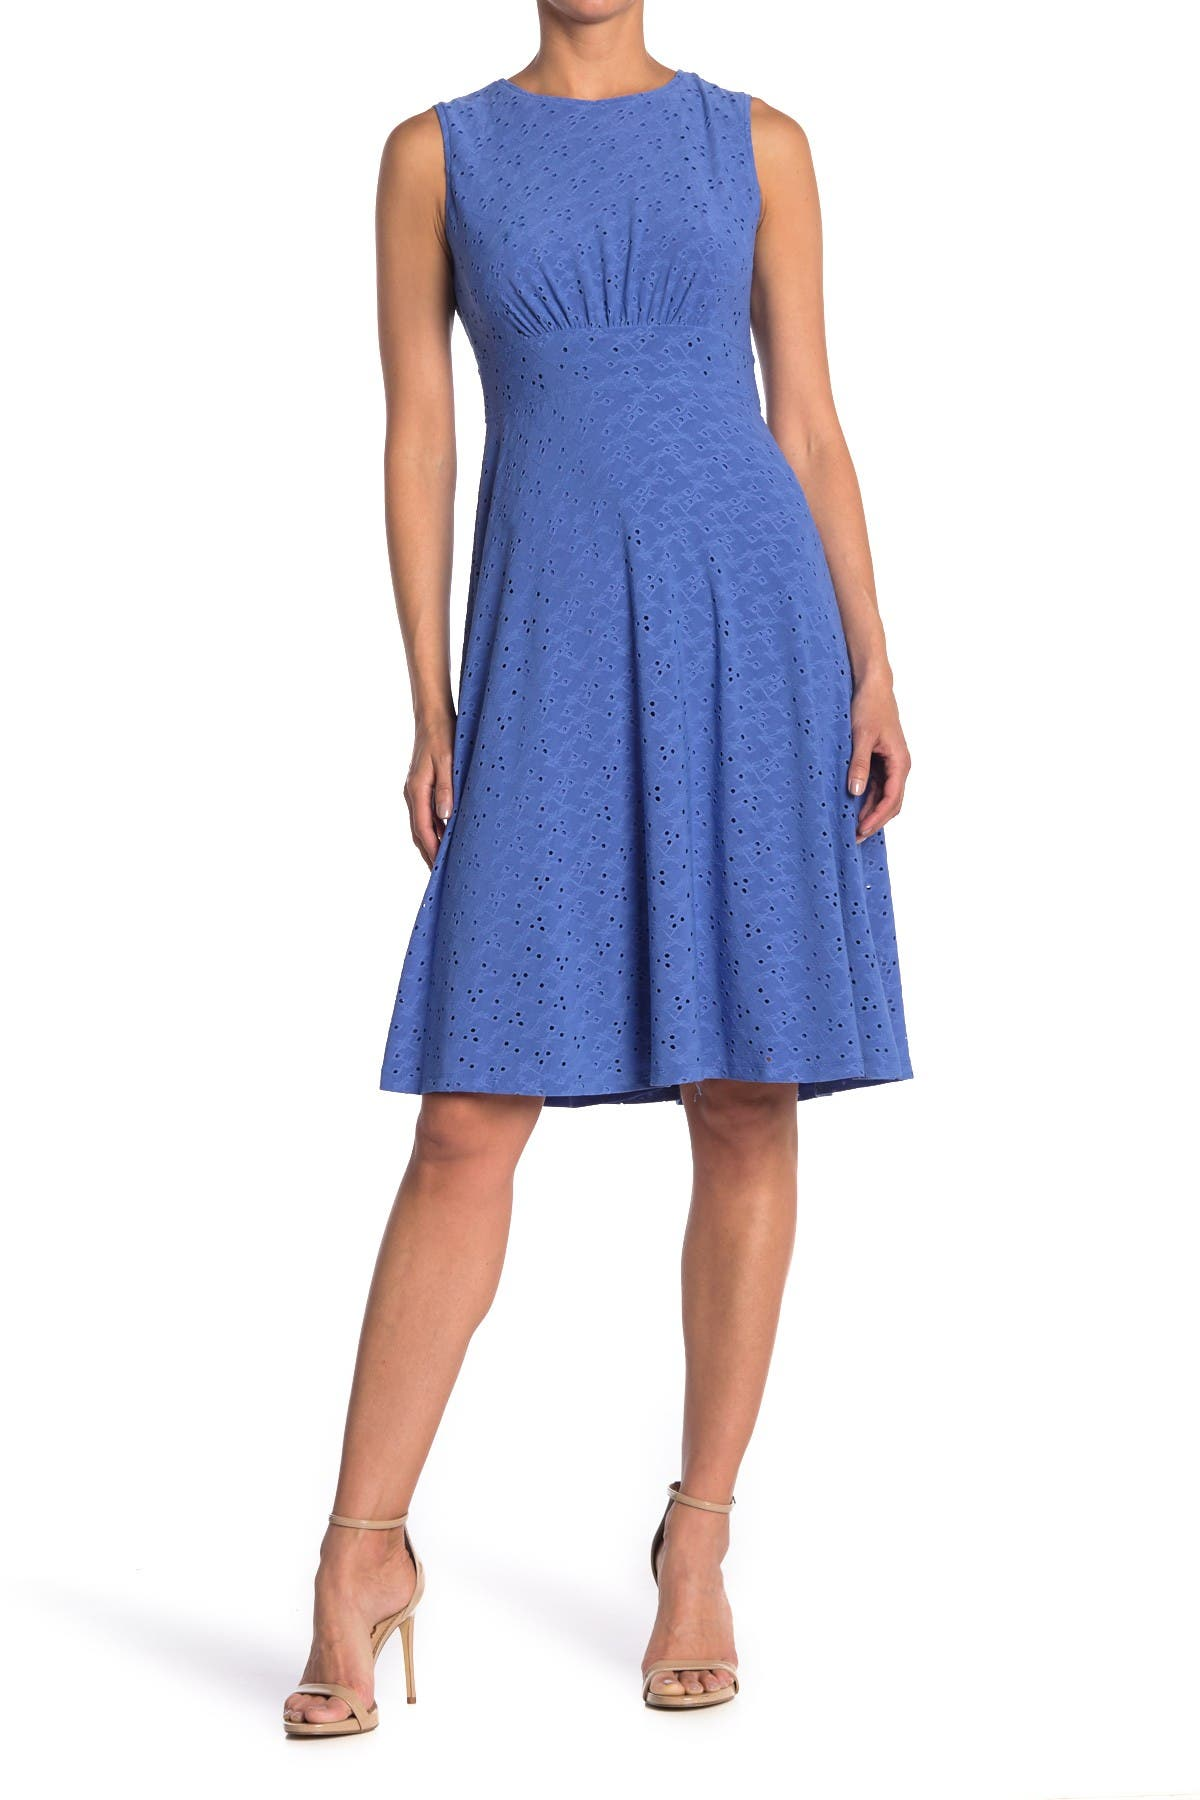 Image of London Times Jersey Eyelet Midi Dress